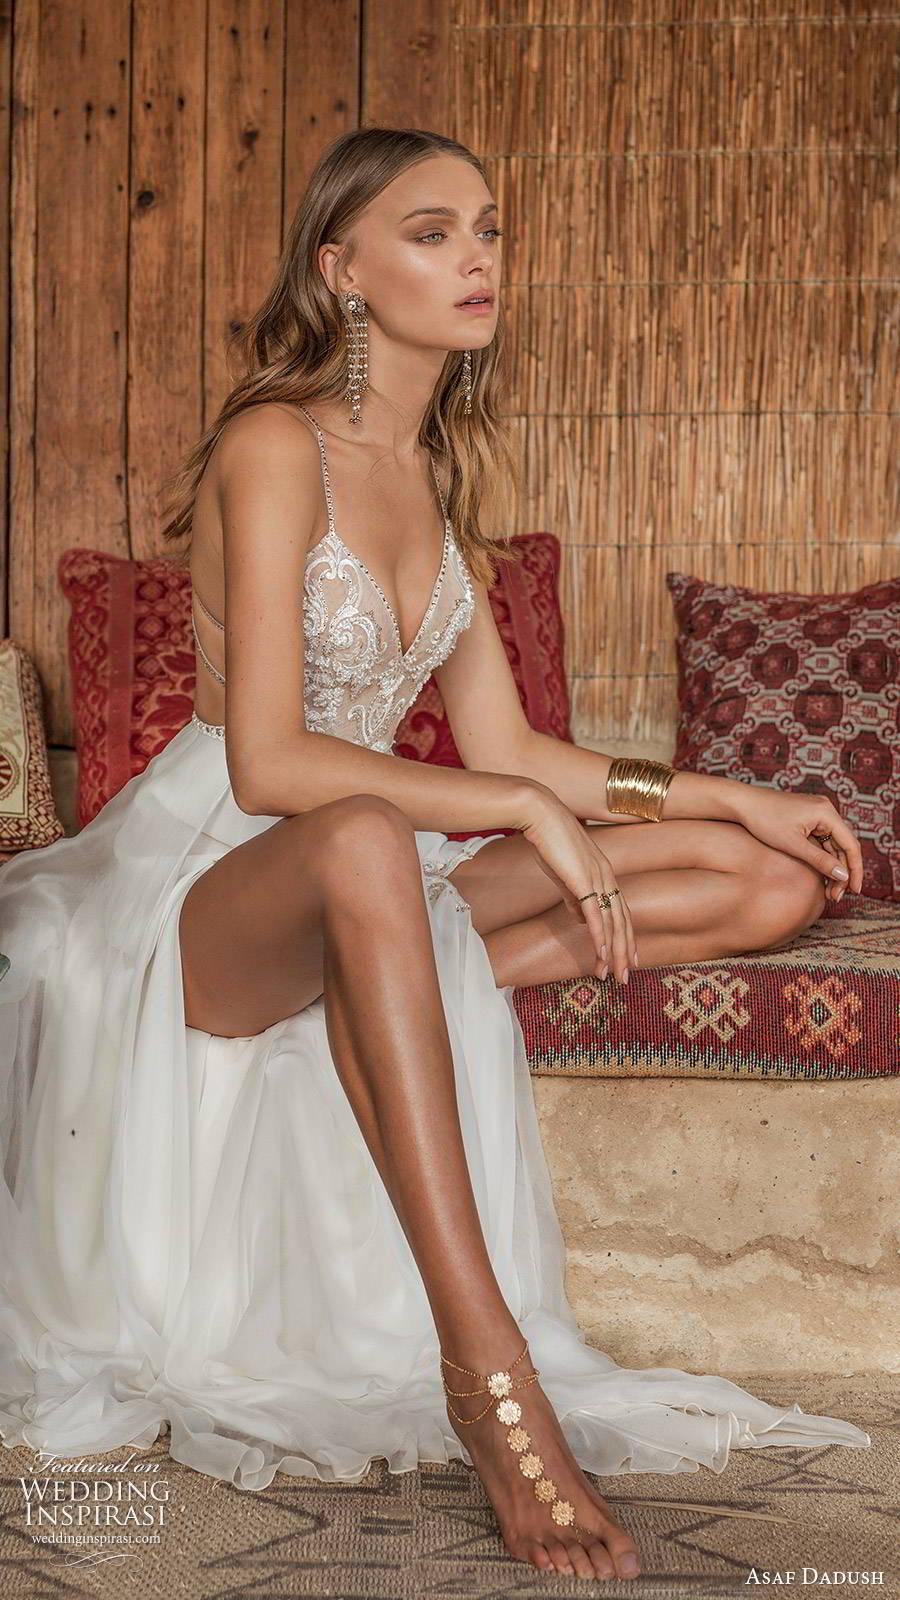 asaf dadush 2019 bridal sleeveless thin straps v neckline embellished bodice double slit skirt glam sexy a line wedding dress (5) zsv